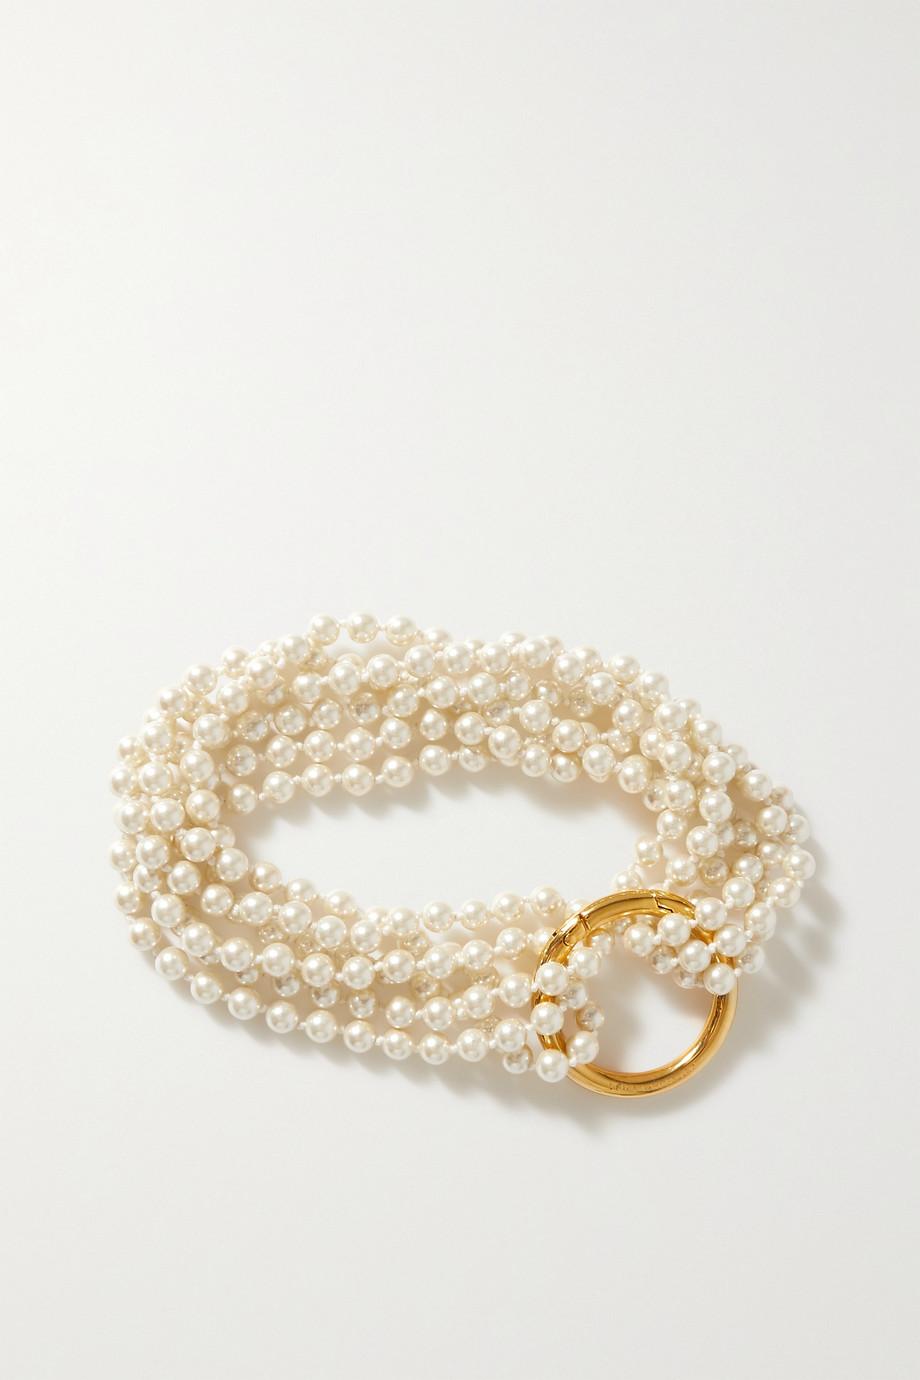 Dries Van Noten Gold-tone faux pearl necklace